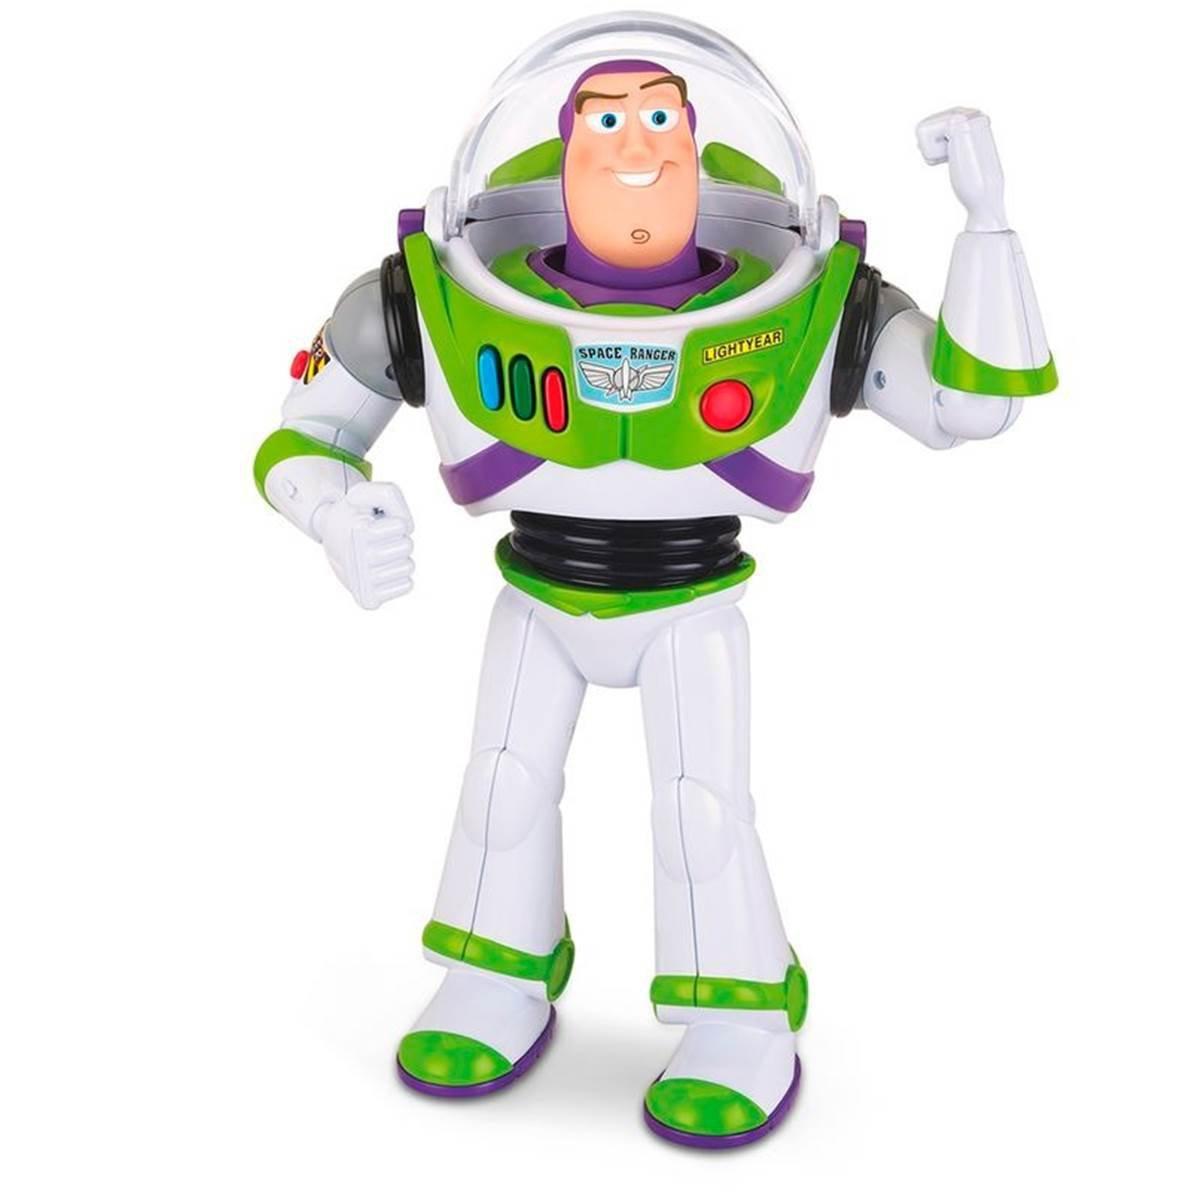 Boneco Buzz Lightyear Com Som Toy Story Disney - Toyng 35716